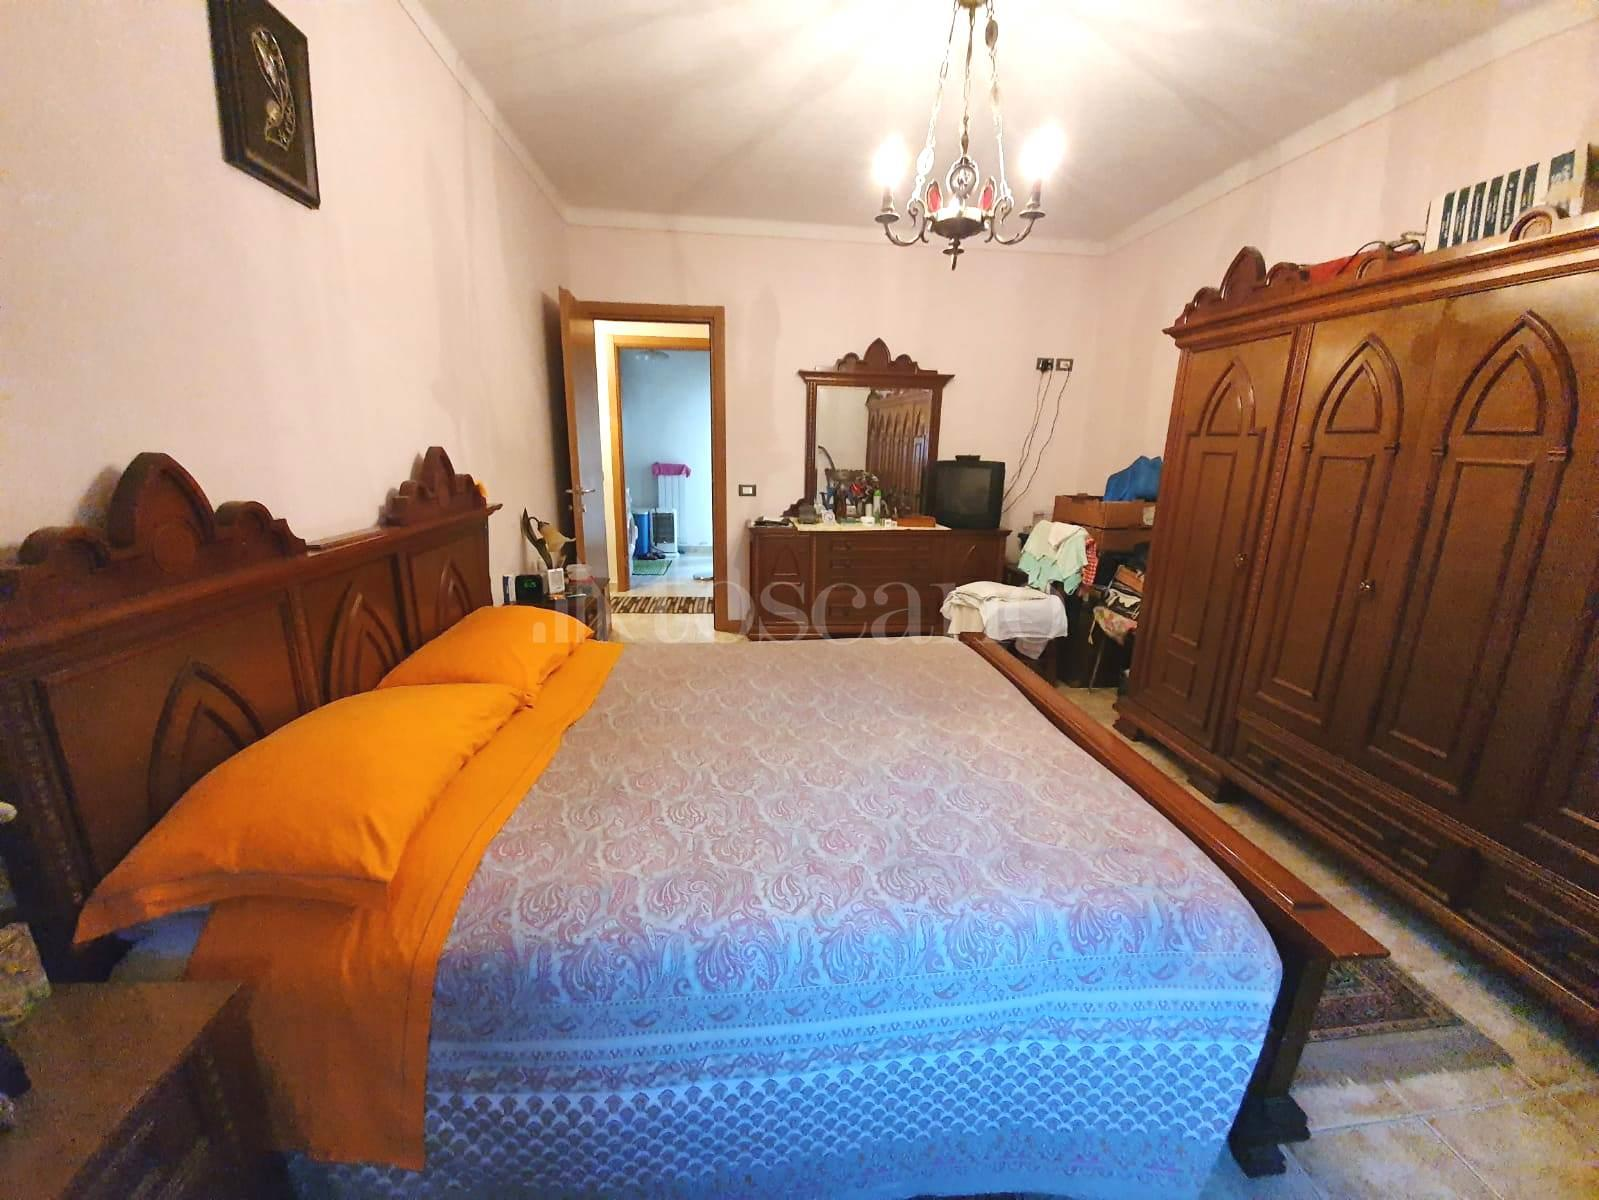 Vendita Casa A Villa Carcina In Ad Ze Via Trafilerie 2 2021 Toscano